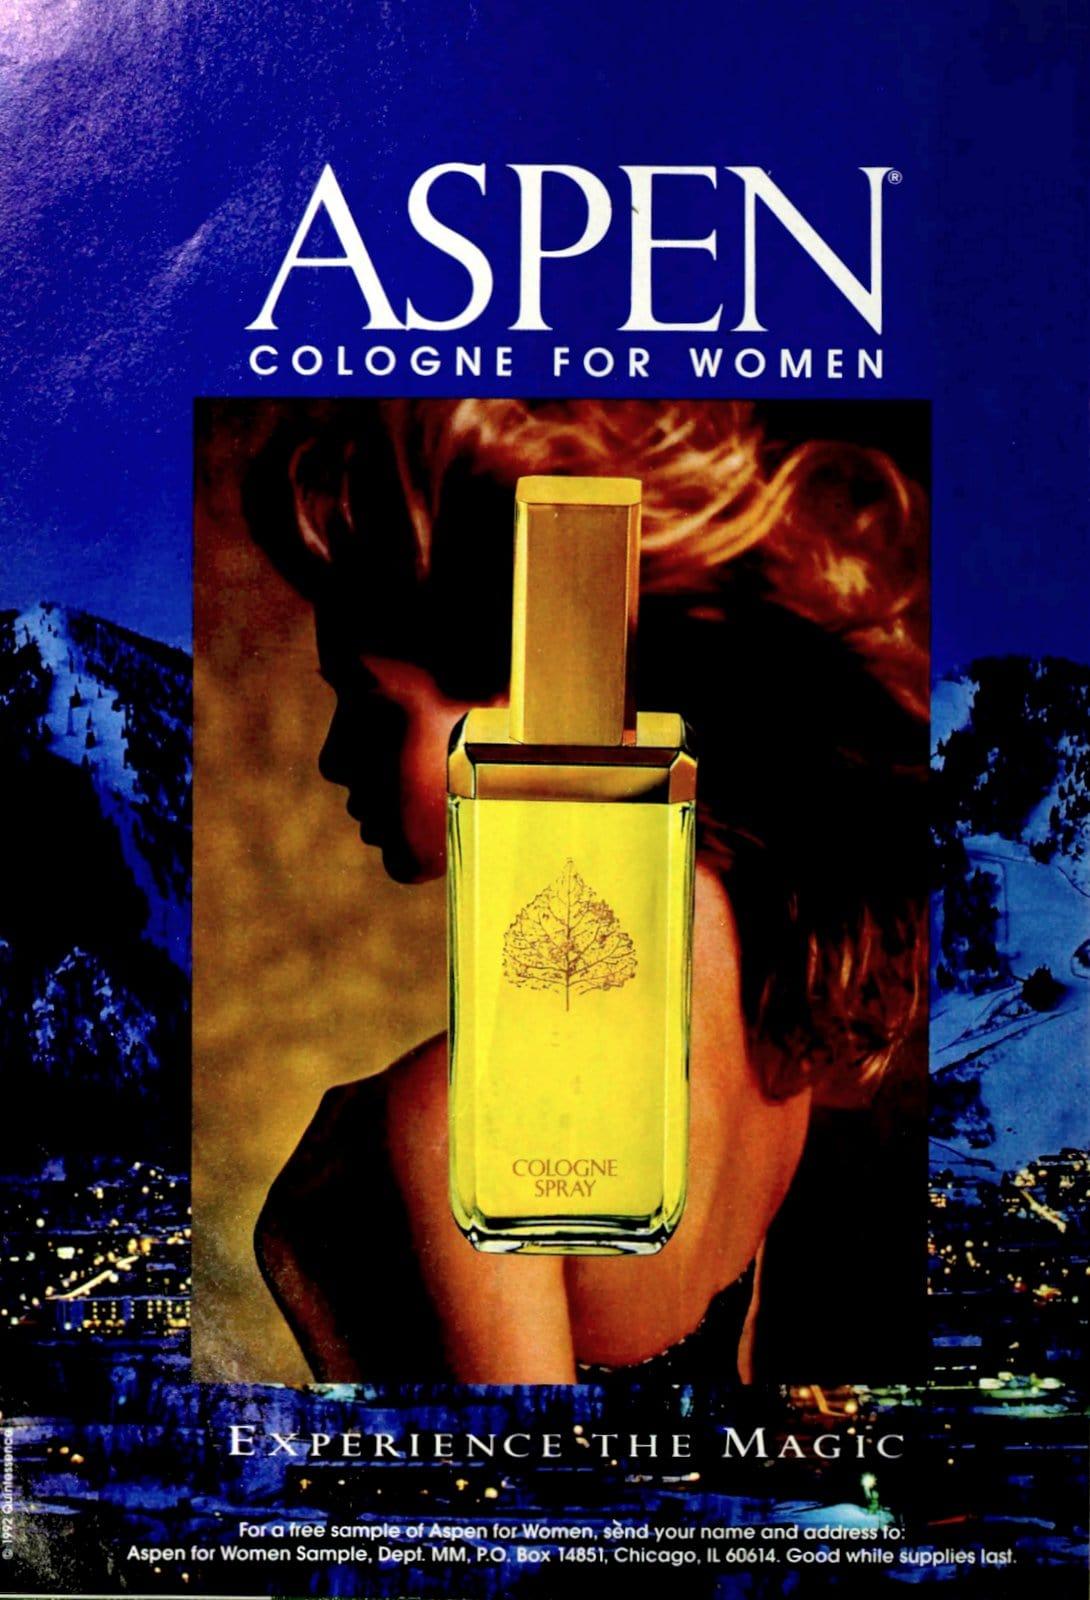 Aspen cologne for women (1993) at ClickAmericana.com